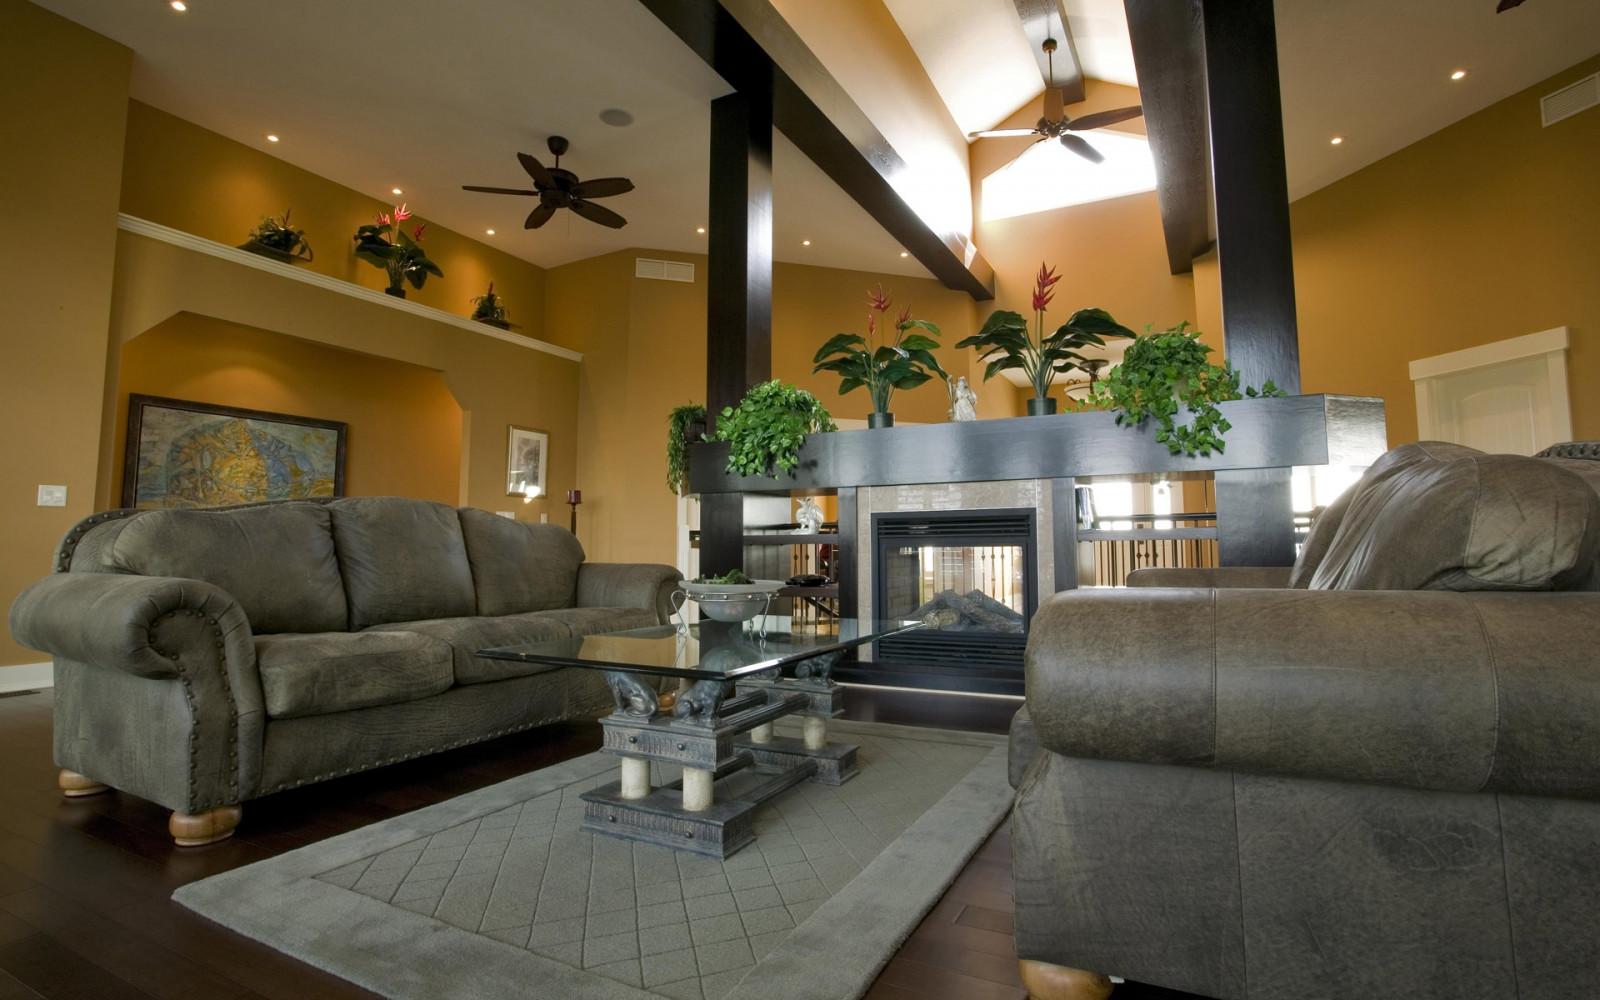 living room sweet special design sofa   Wallpaper : fireplace, interior design, sofa, lobby, floor ...